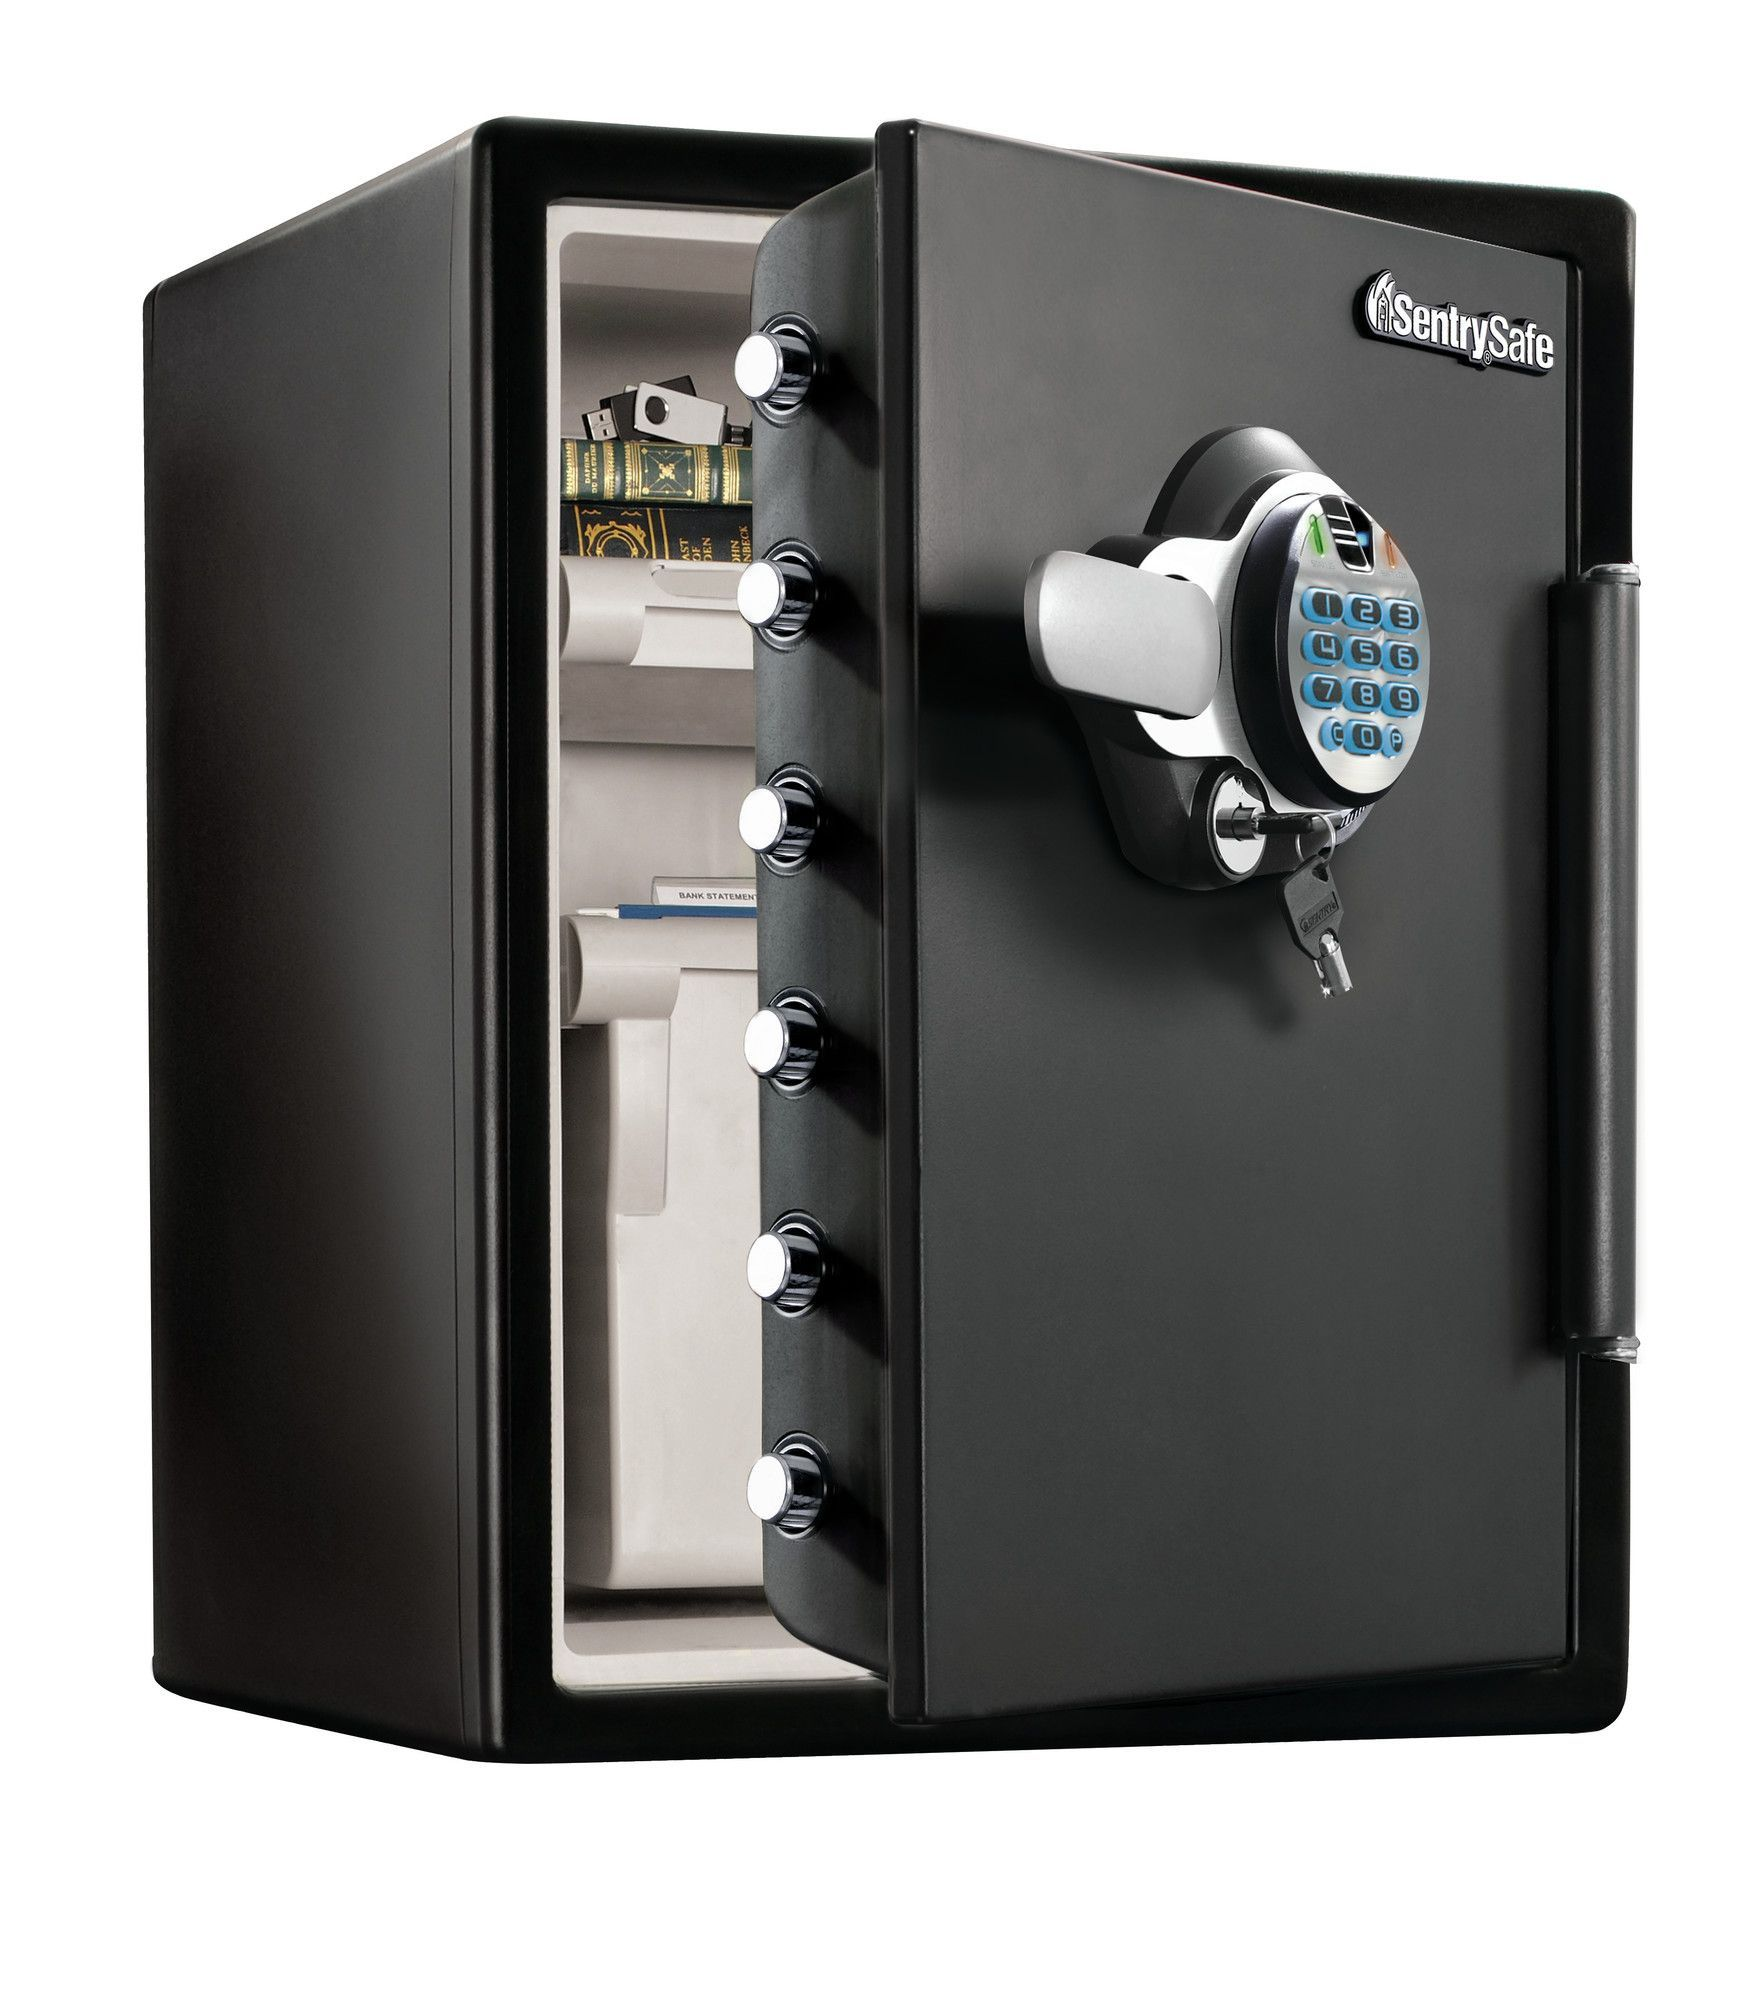 SentrySafe Fingerprint Waterresistant DualLock Security